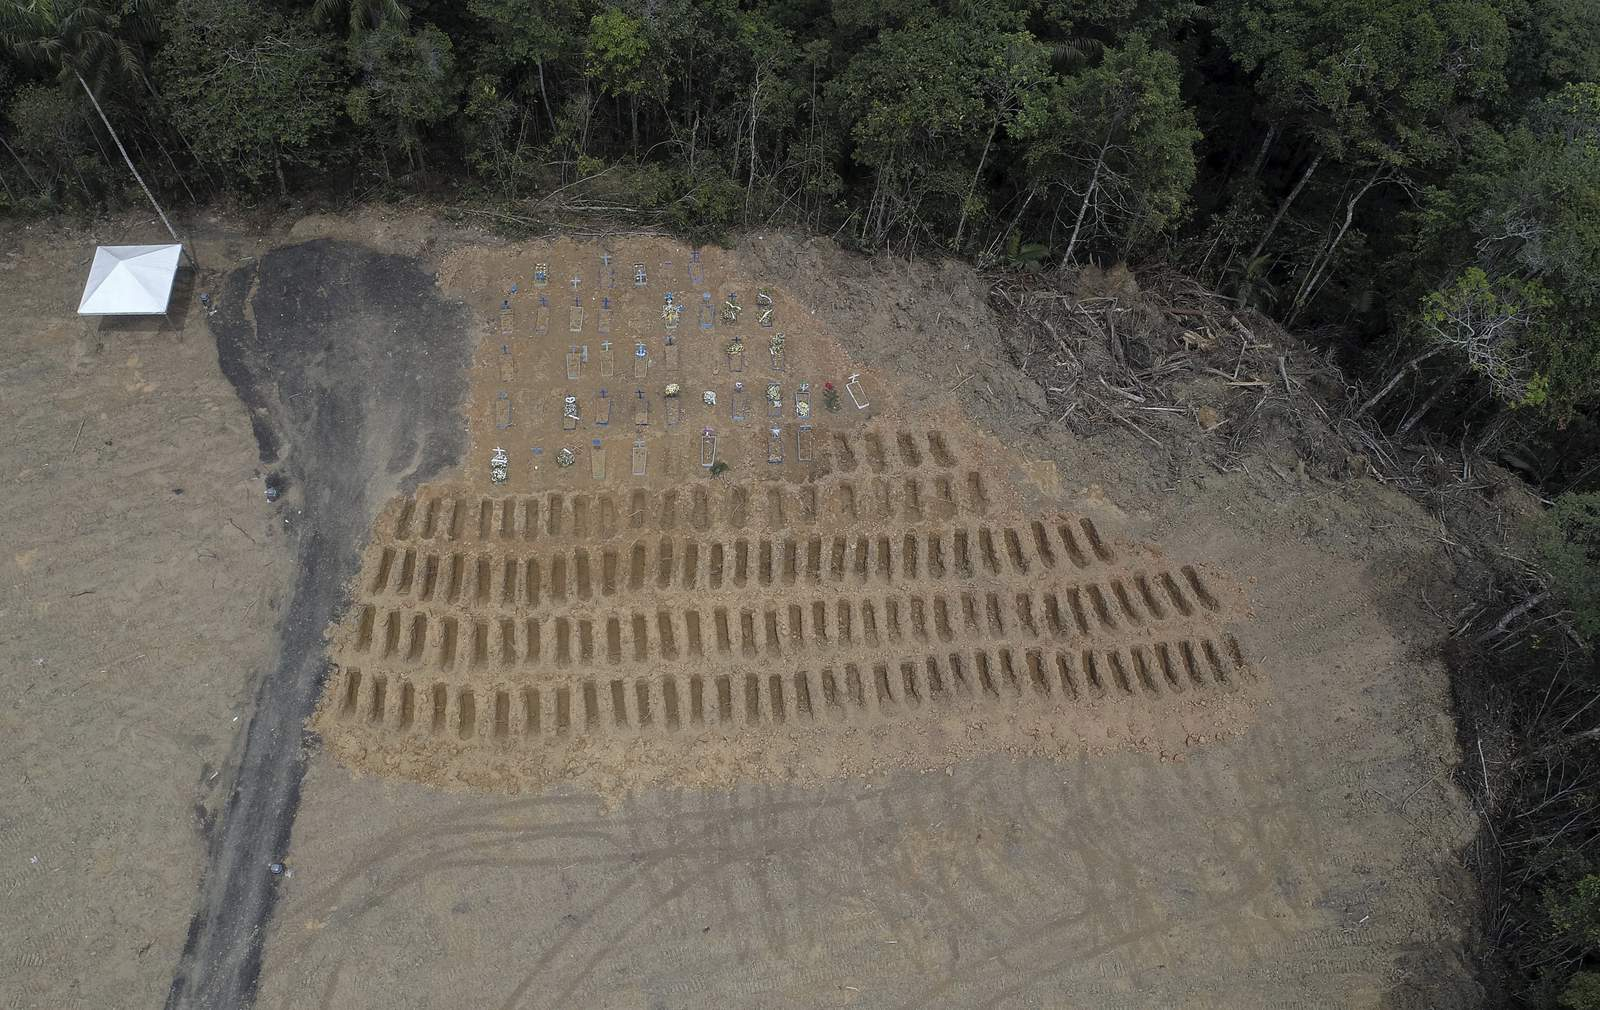 Freshly dug graves are seen at the Nossa Senhora Aparecida cemetery, amid the new coronavirus pandemic in Manaus, Amazonas state, Brazil, Wednesday, April 22, 2020. (AP Photo/Emerson Cardoso)